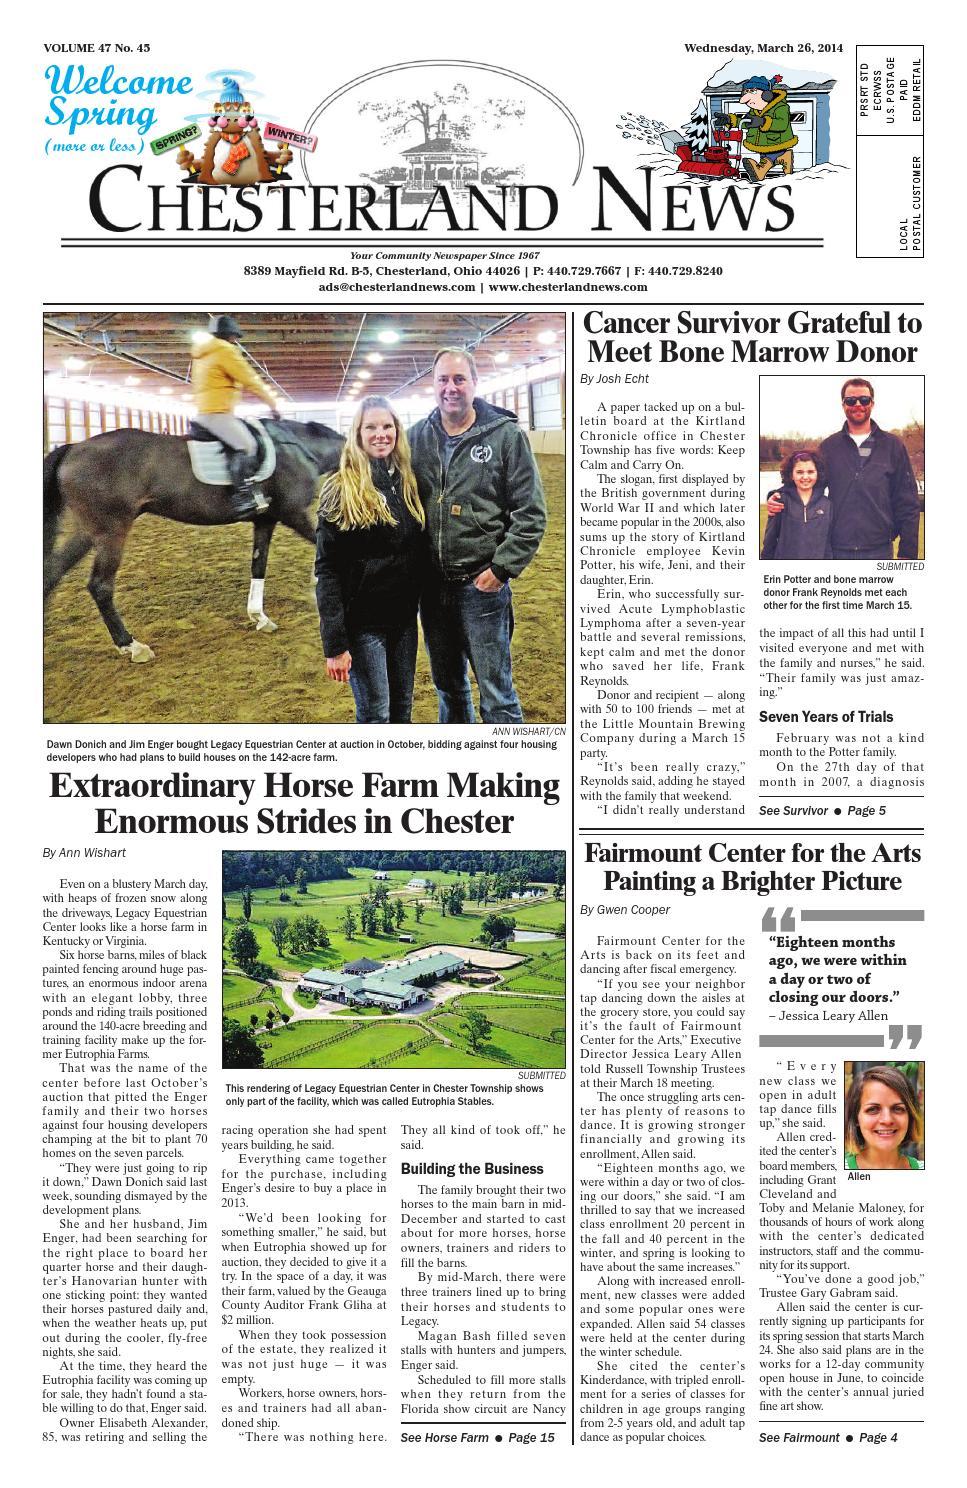 Chesterlandnews 3 26 14 By Chesterland News Issuu